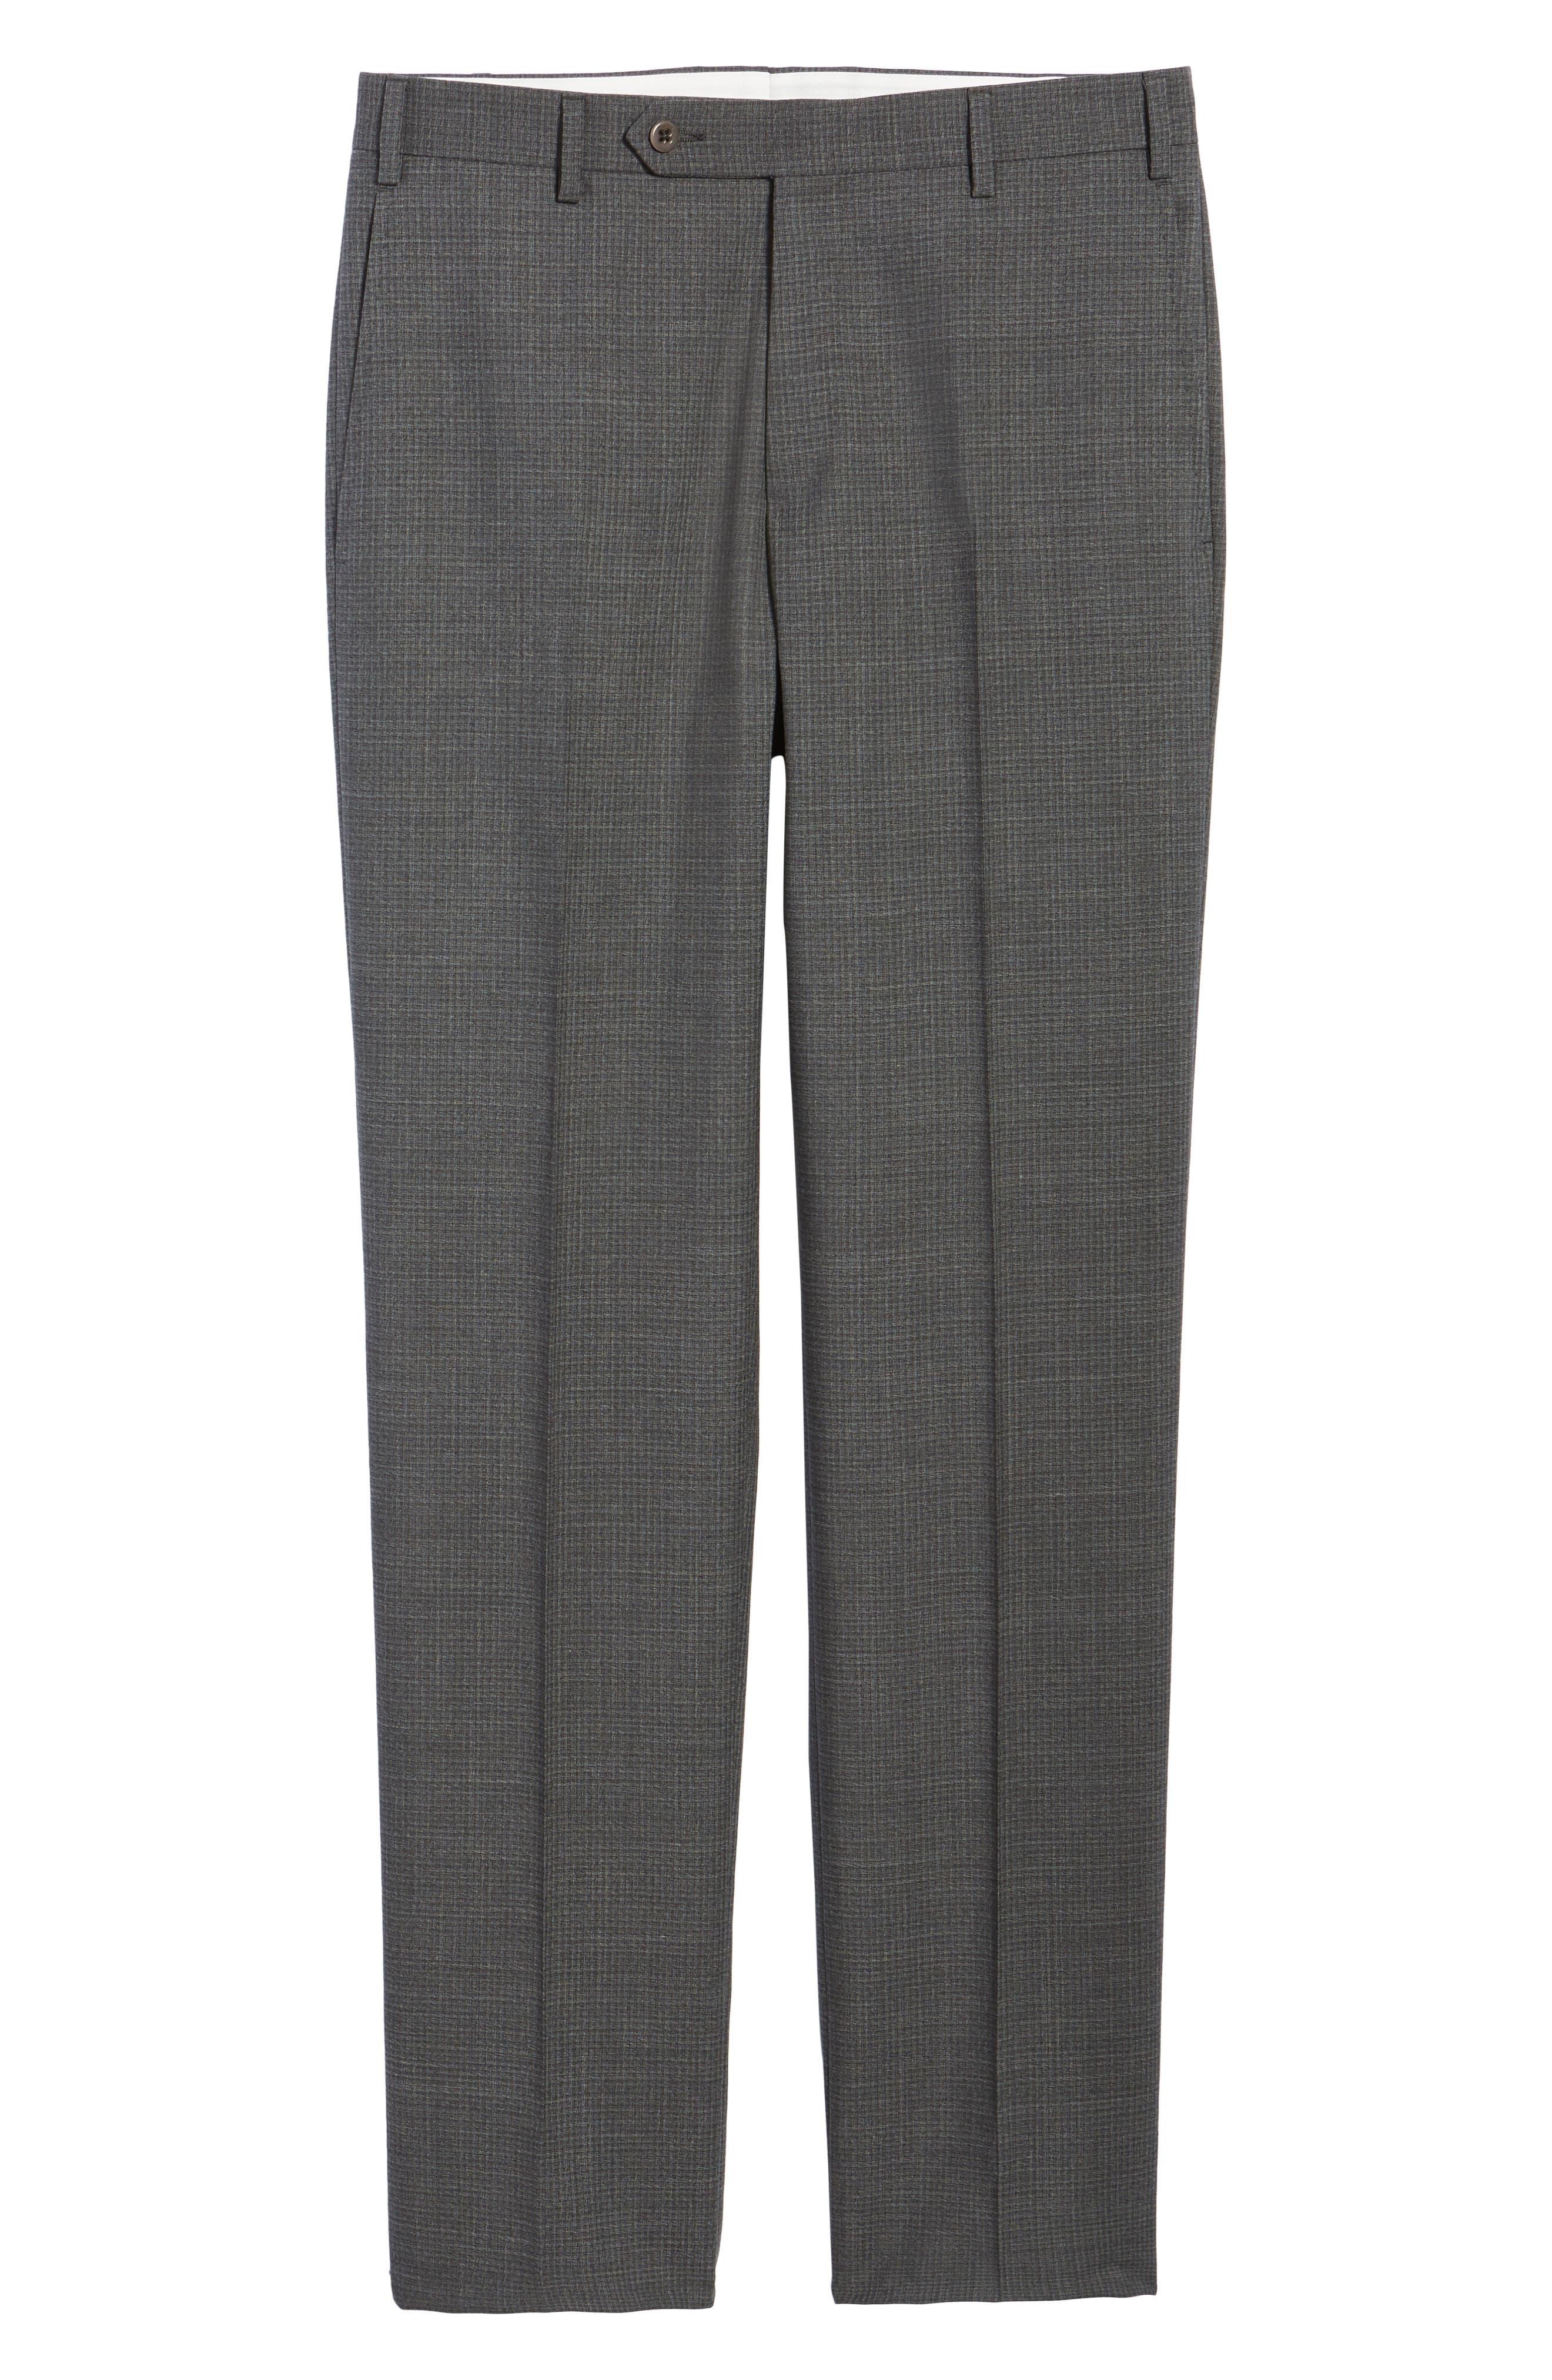 Devon Flat Front Check Wool Trousers,                             Alternate thumbnail 6, color,                             Dark Grey